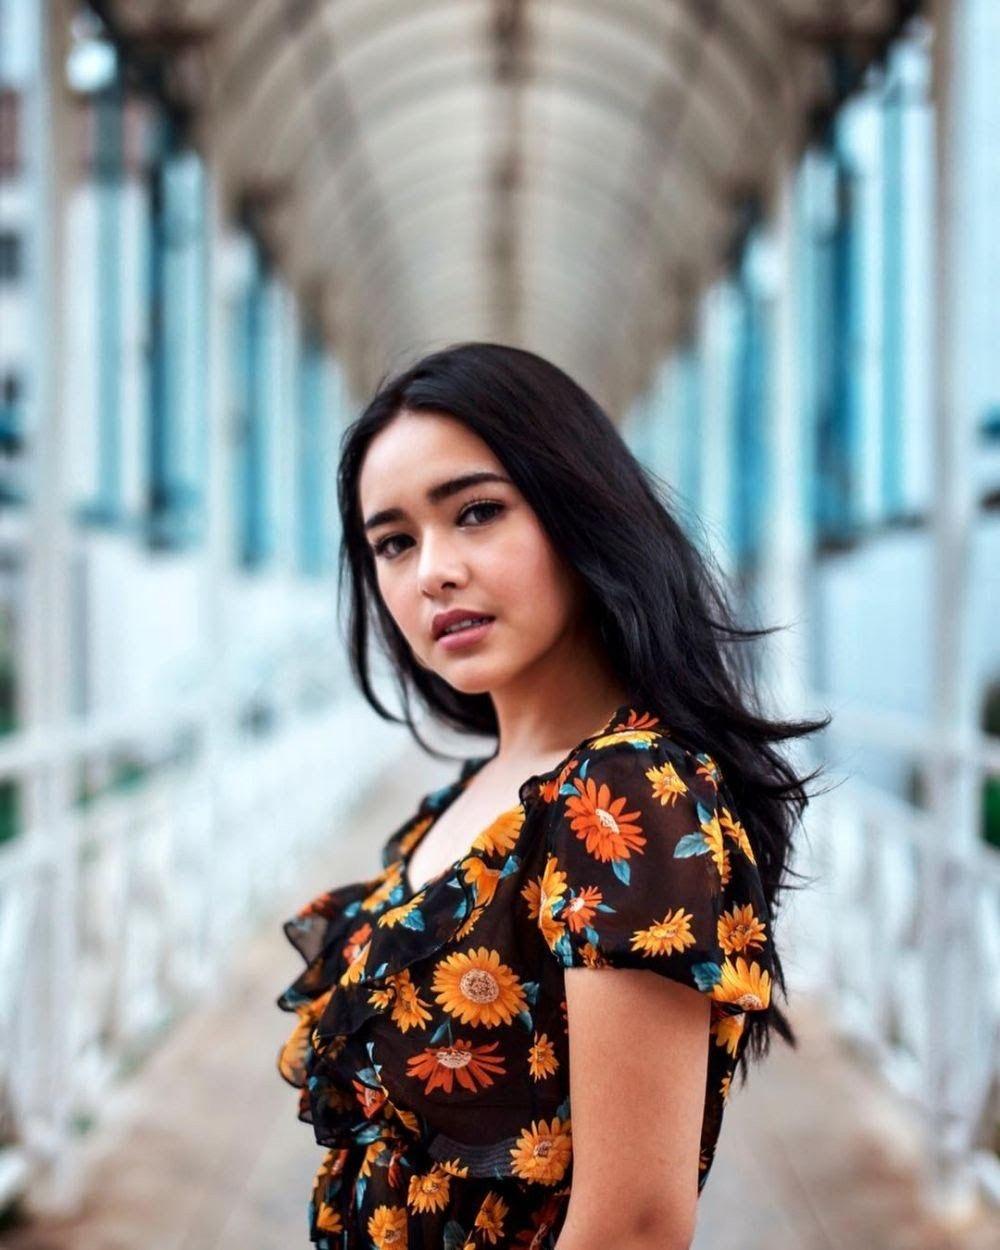 Amanda Manopo Aktris Rambut Pendek Fotografi